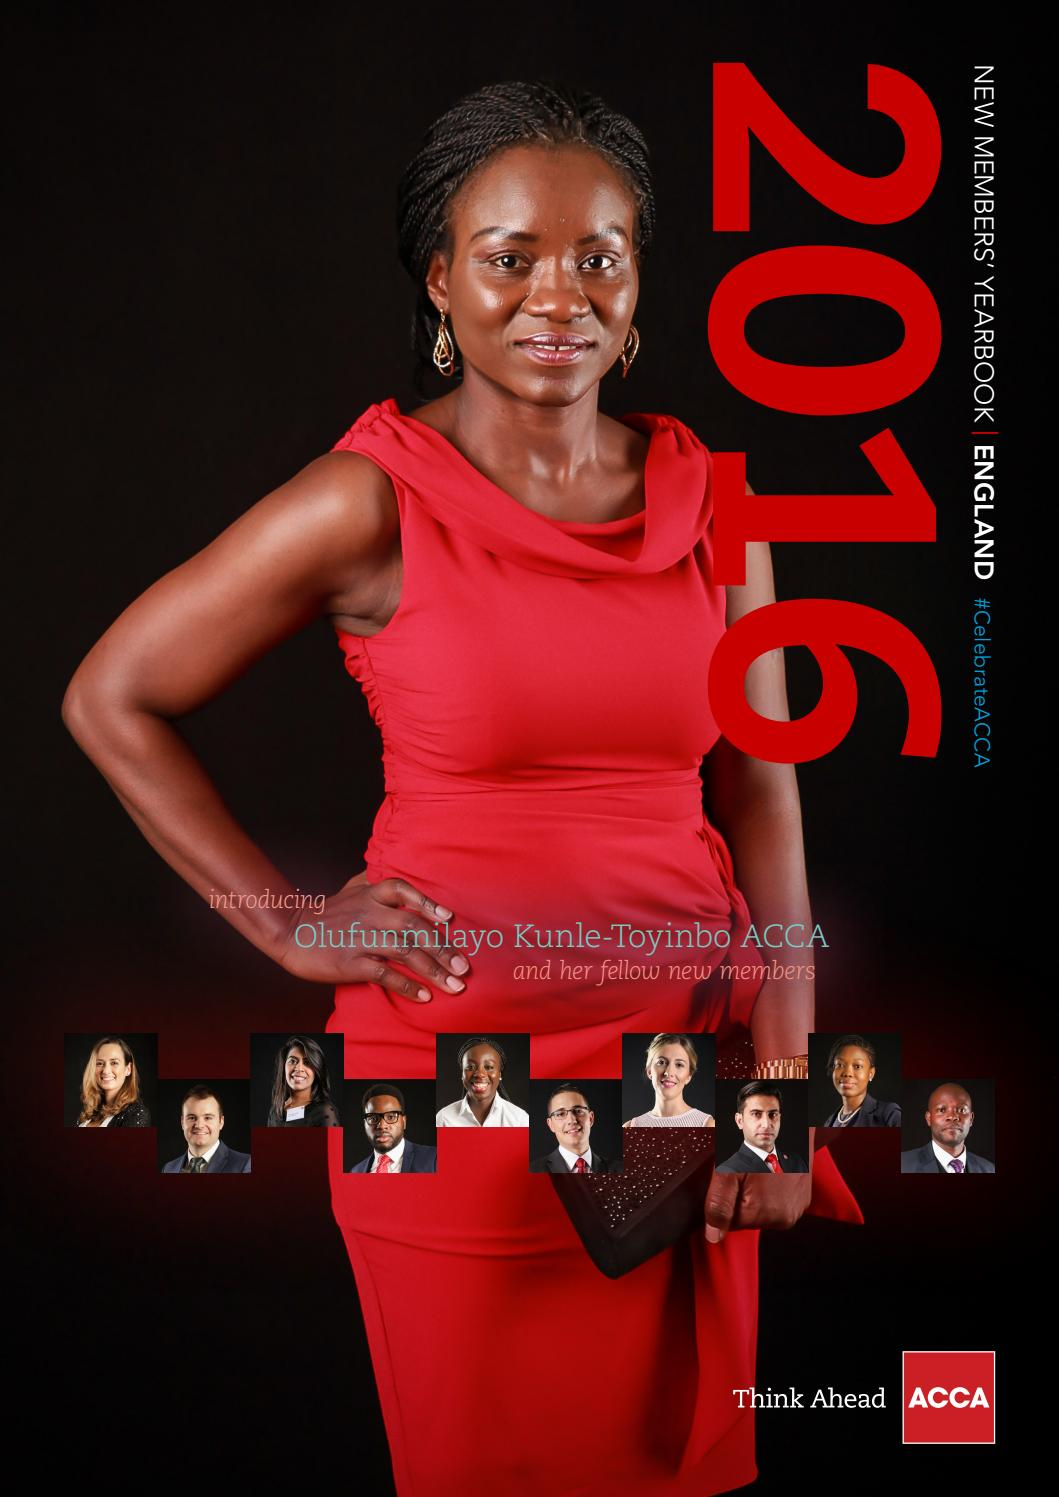 Olufunmilayo Kunle Toyinbo by ACCA_Yearbook - issuu